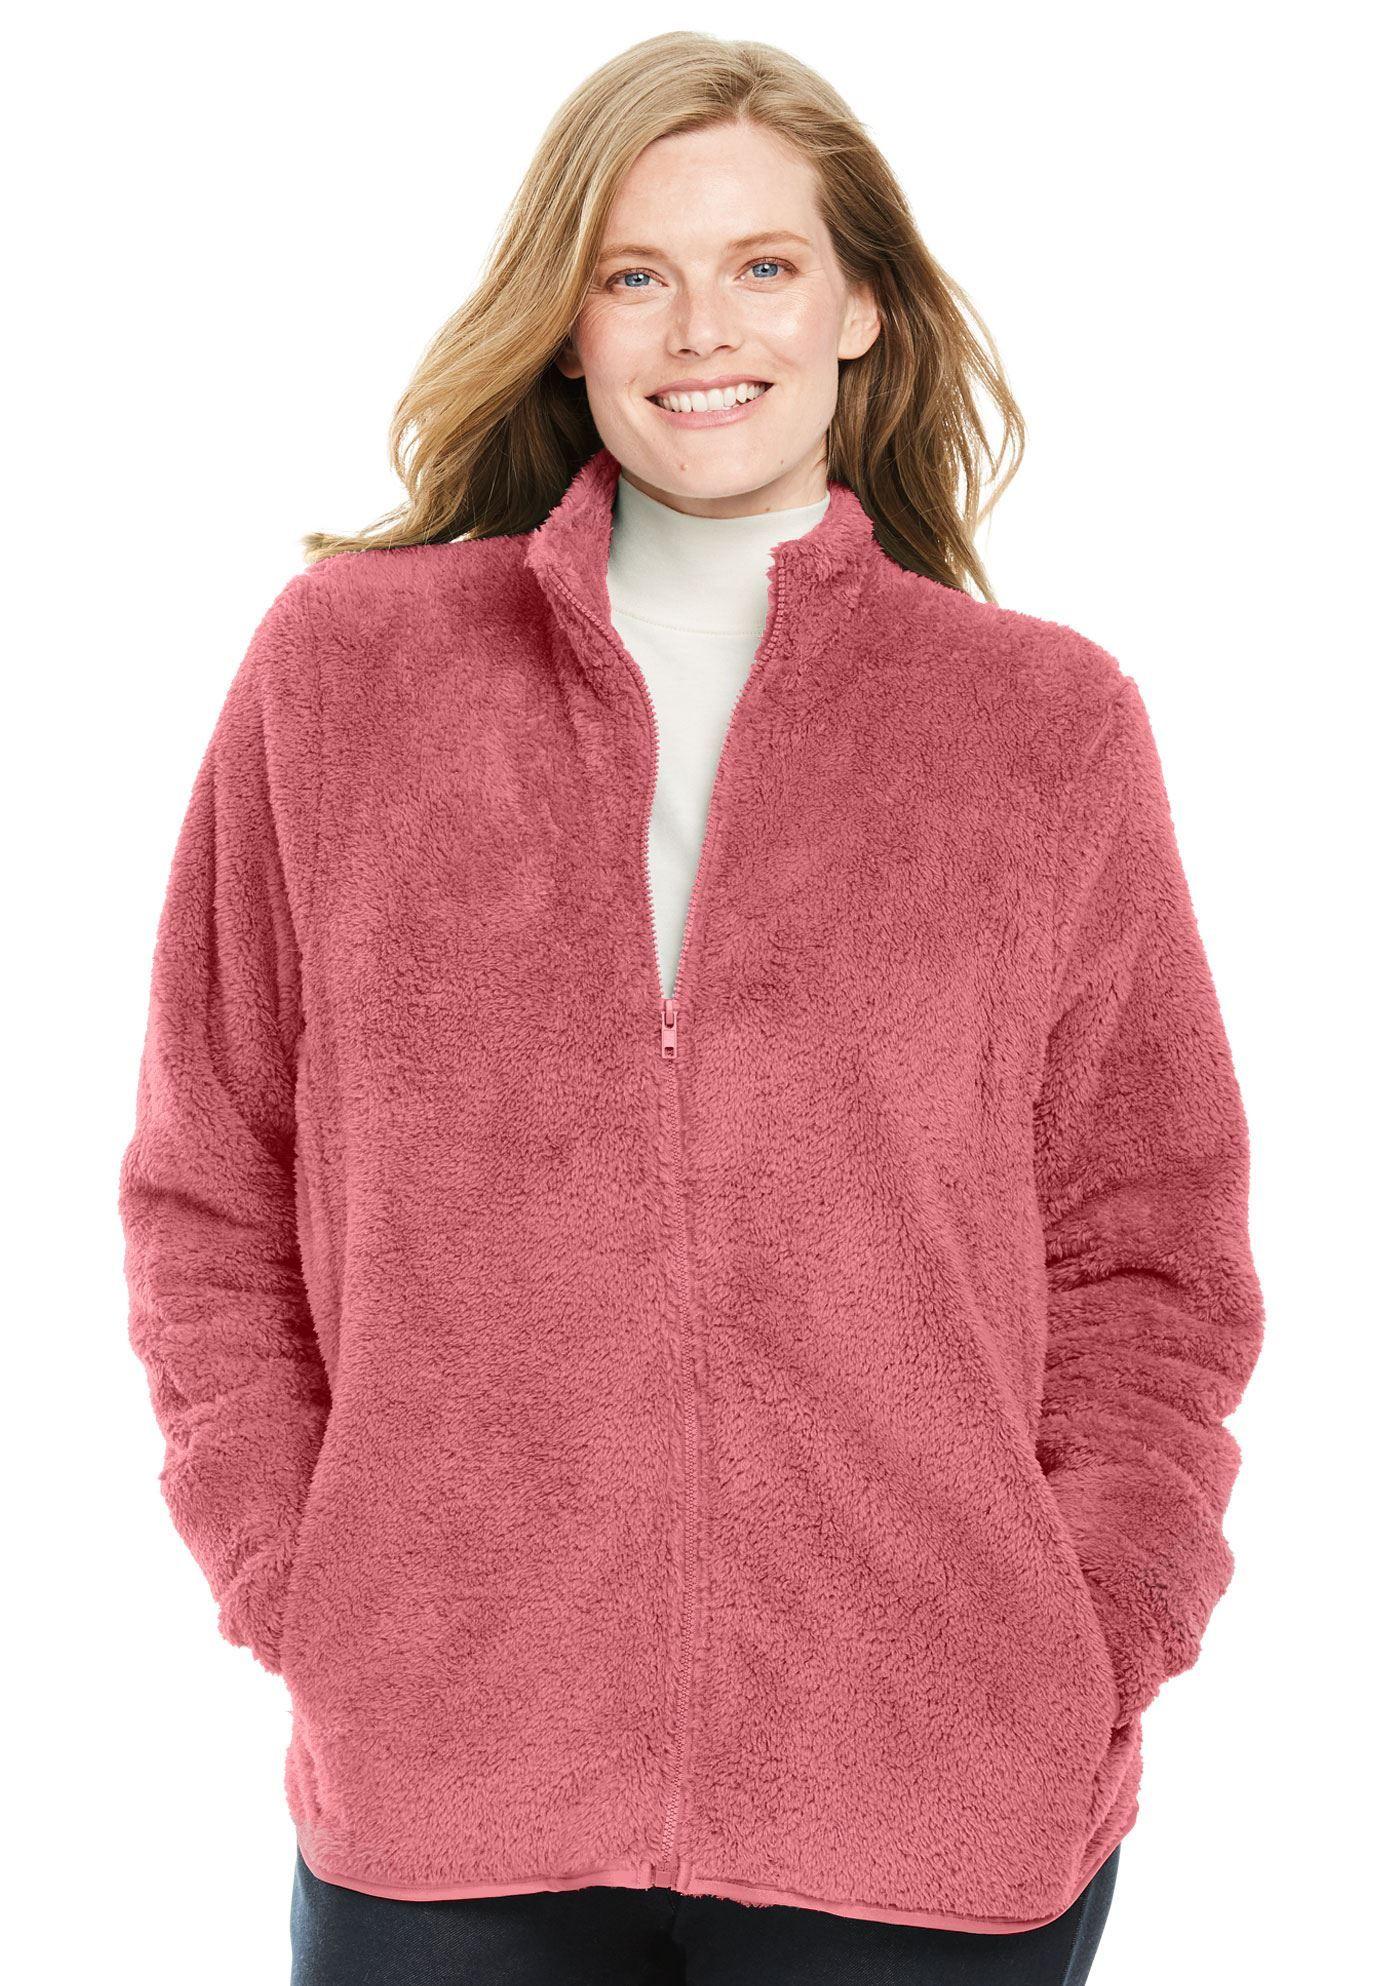 eabdeba767a Fluffy Fleece Jacket - Women s Plus Size Clothing